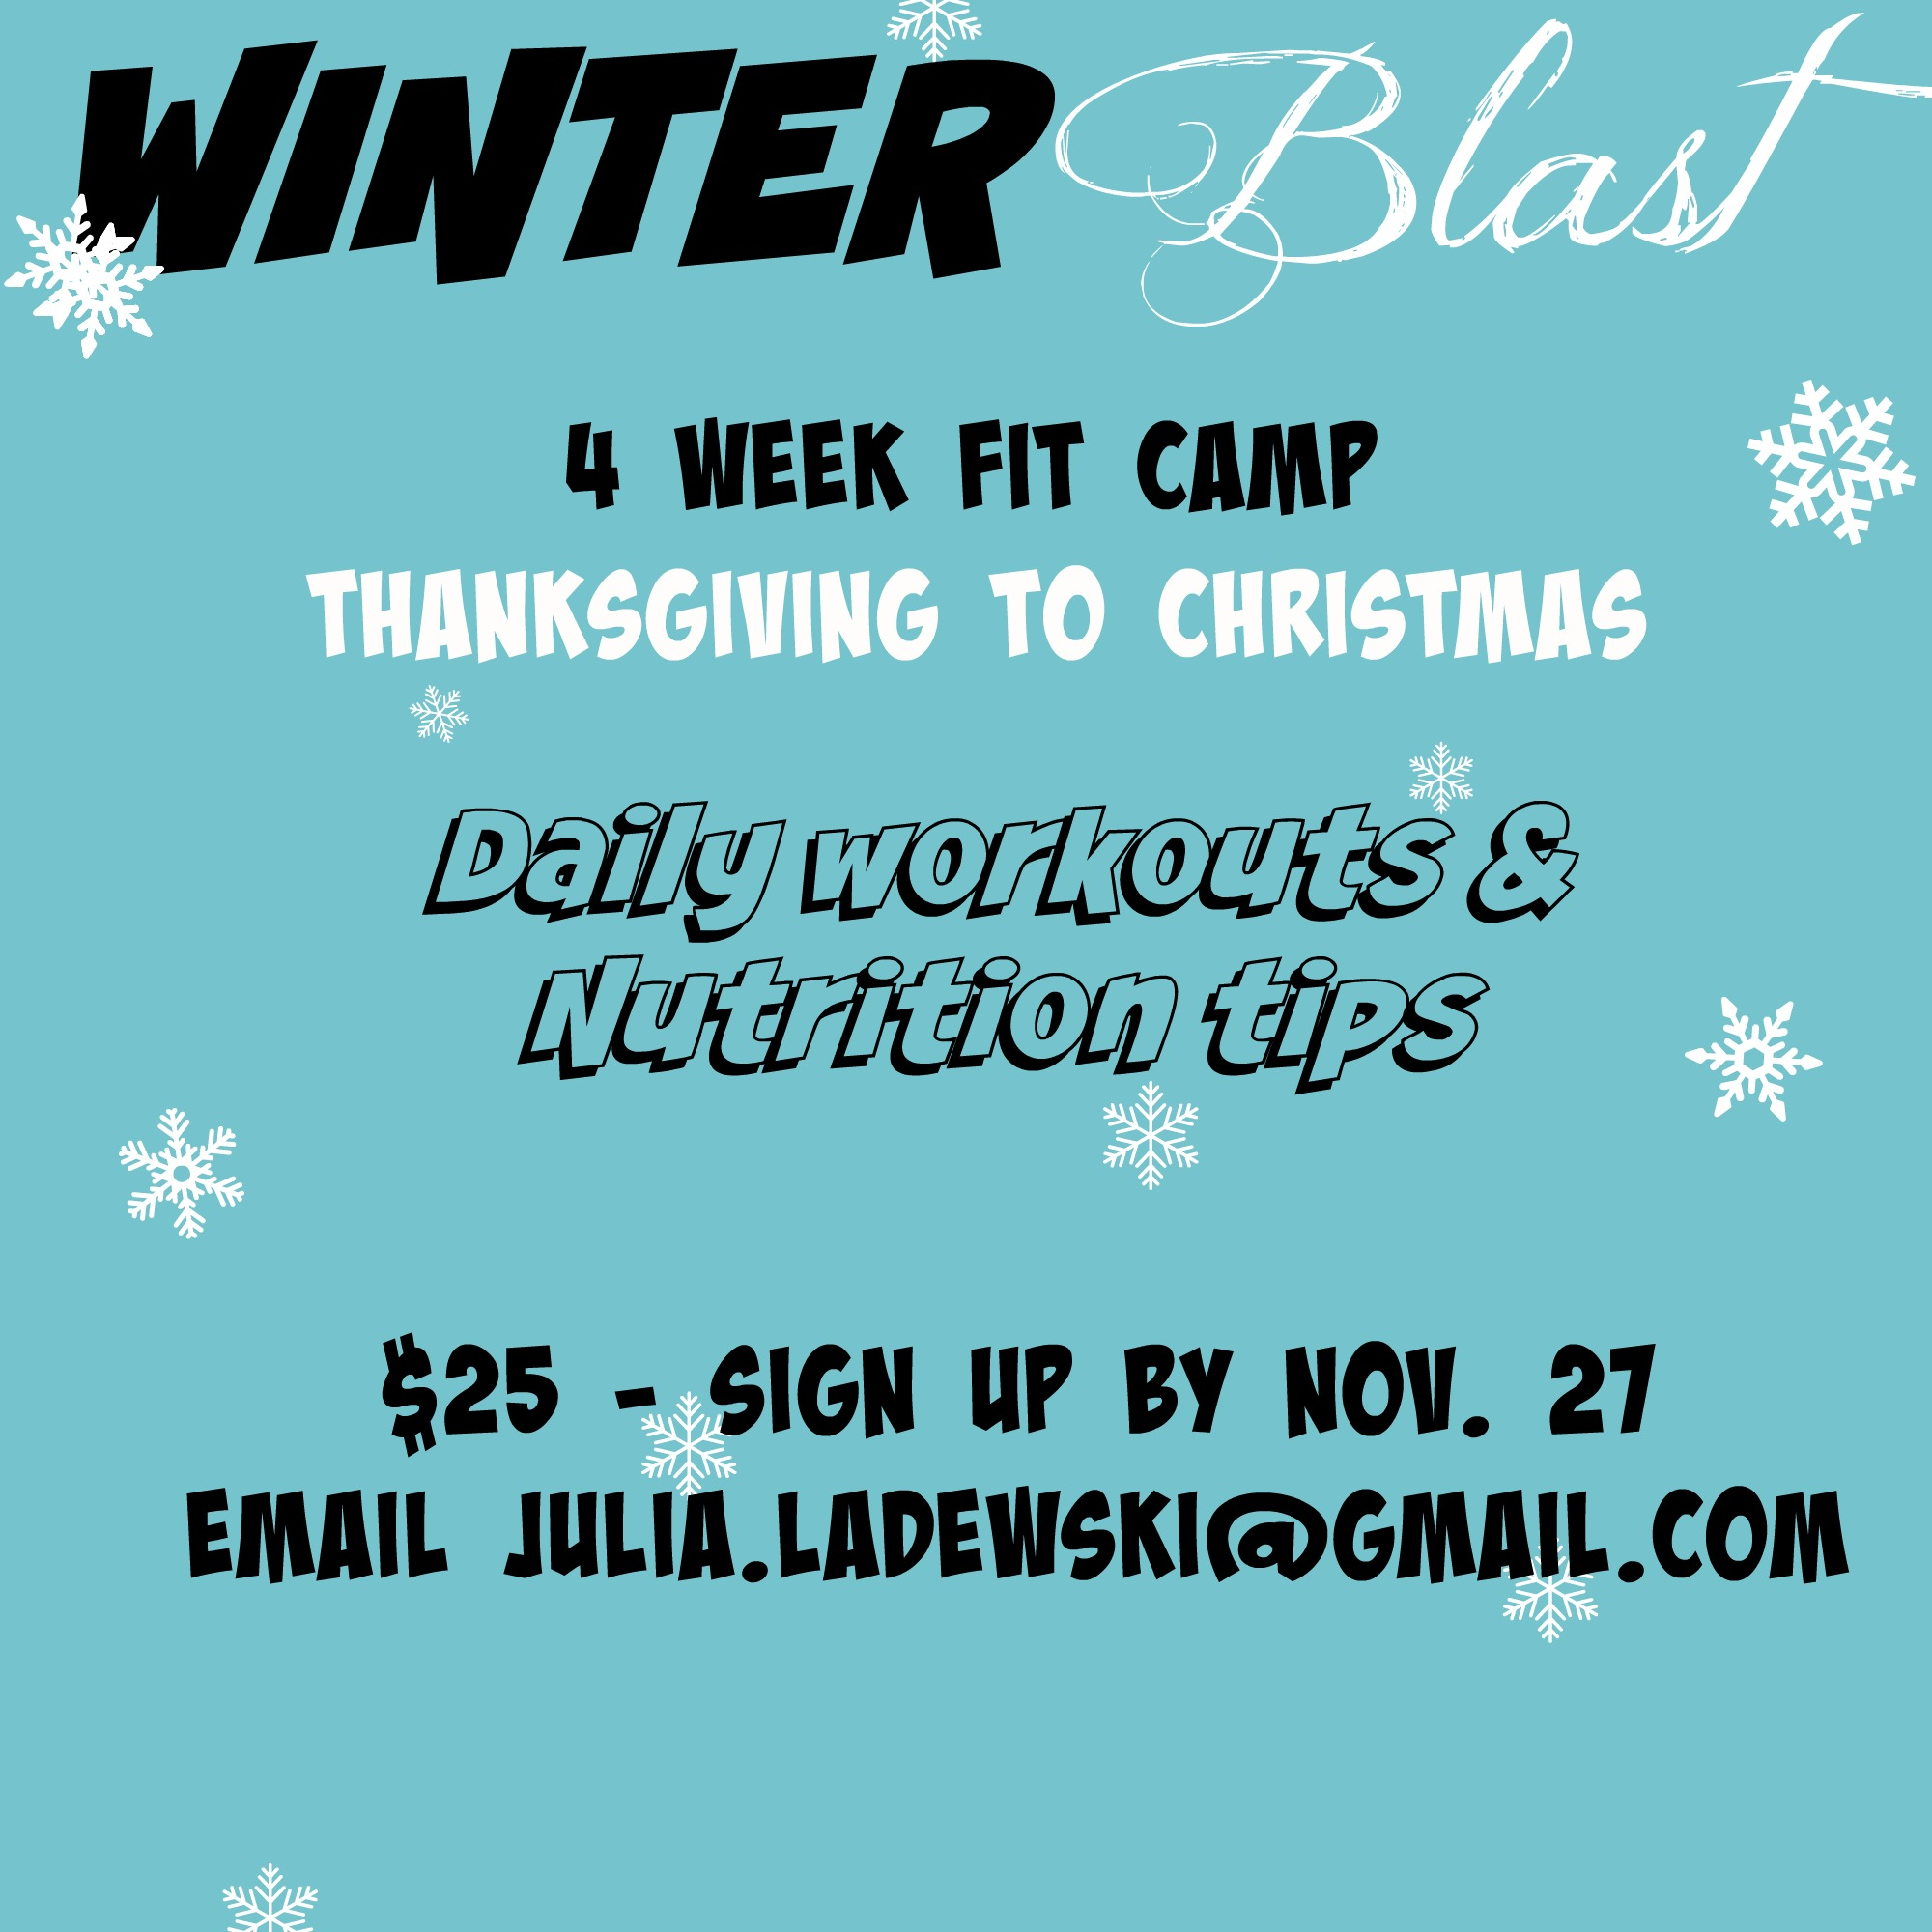 winter blast fit camp